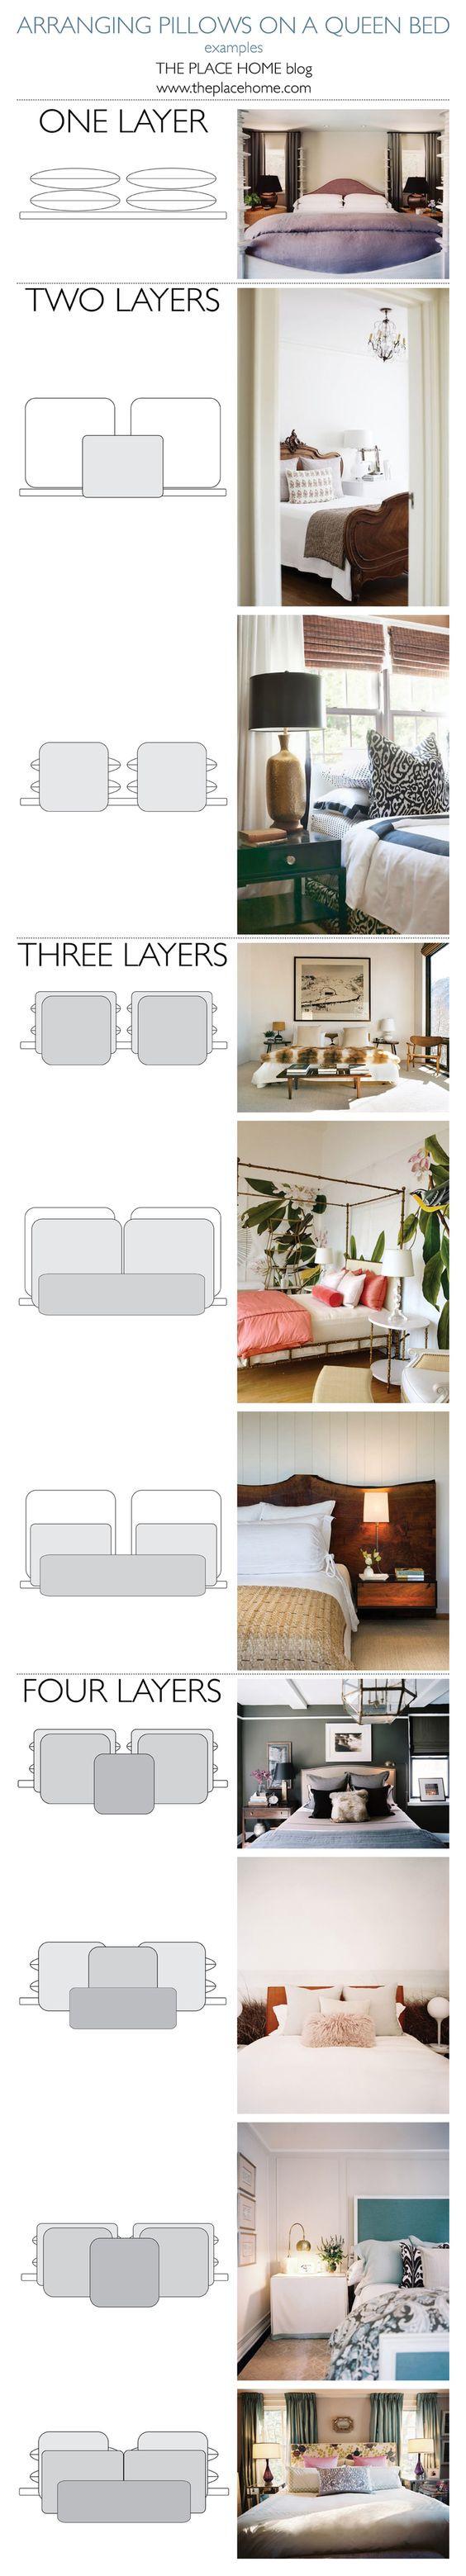 How to arrange pillows